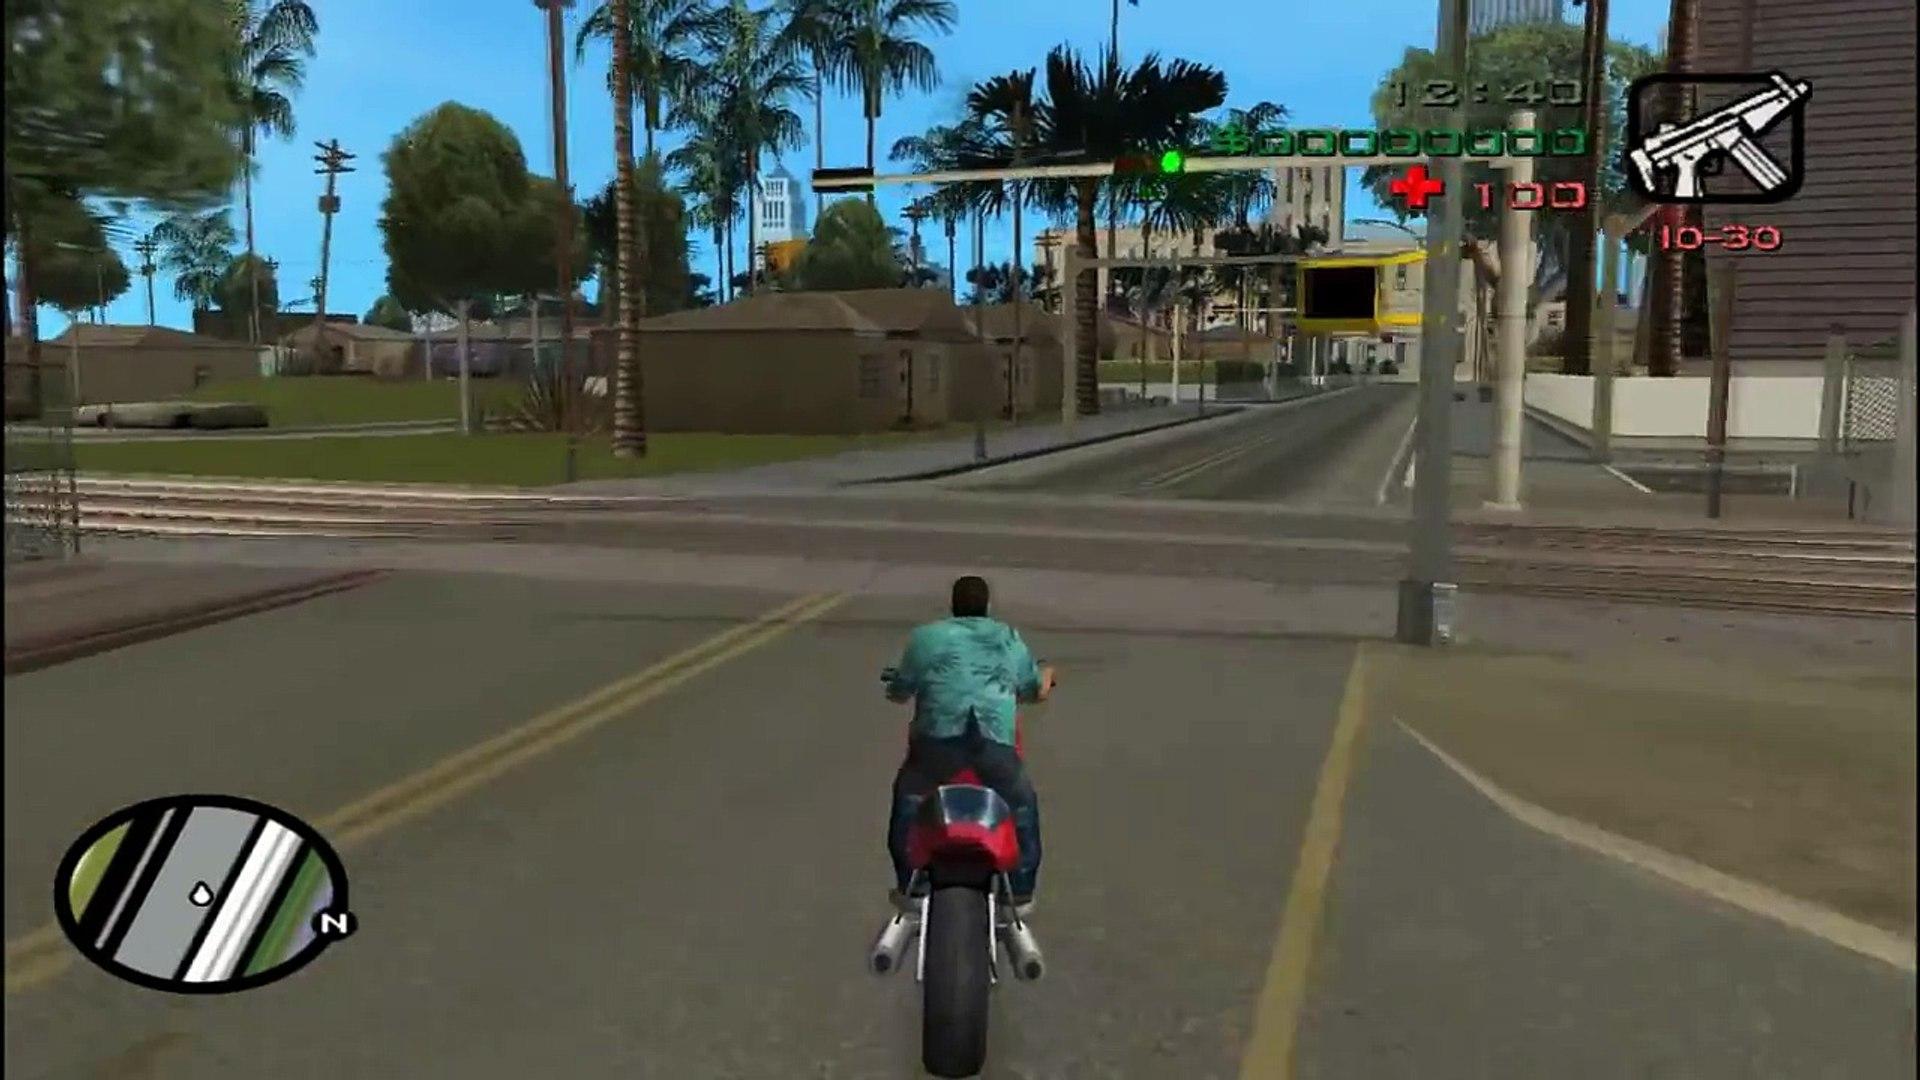 GTA Vice City [PC] - San Andreas Map in Vice City Mod (HD)